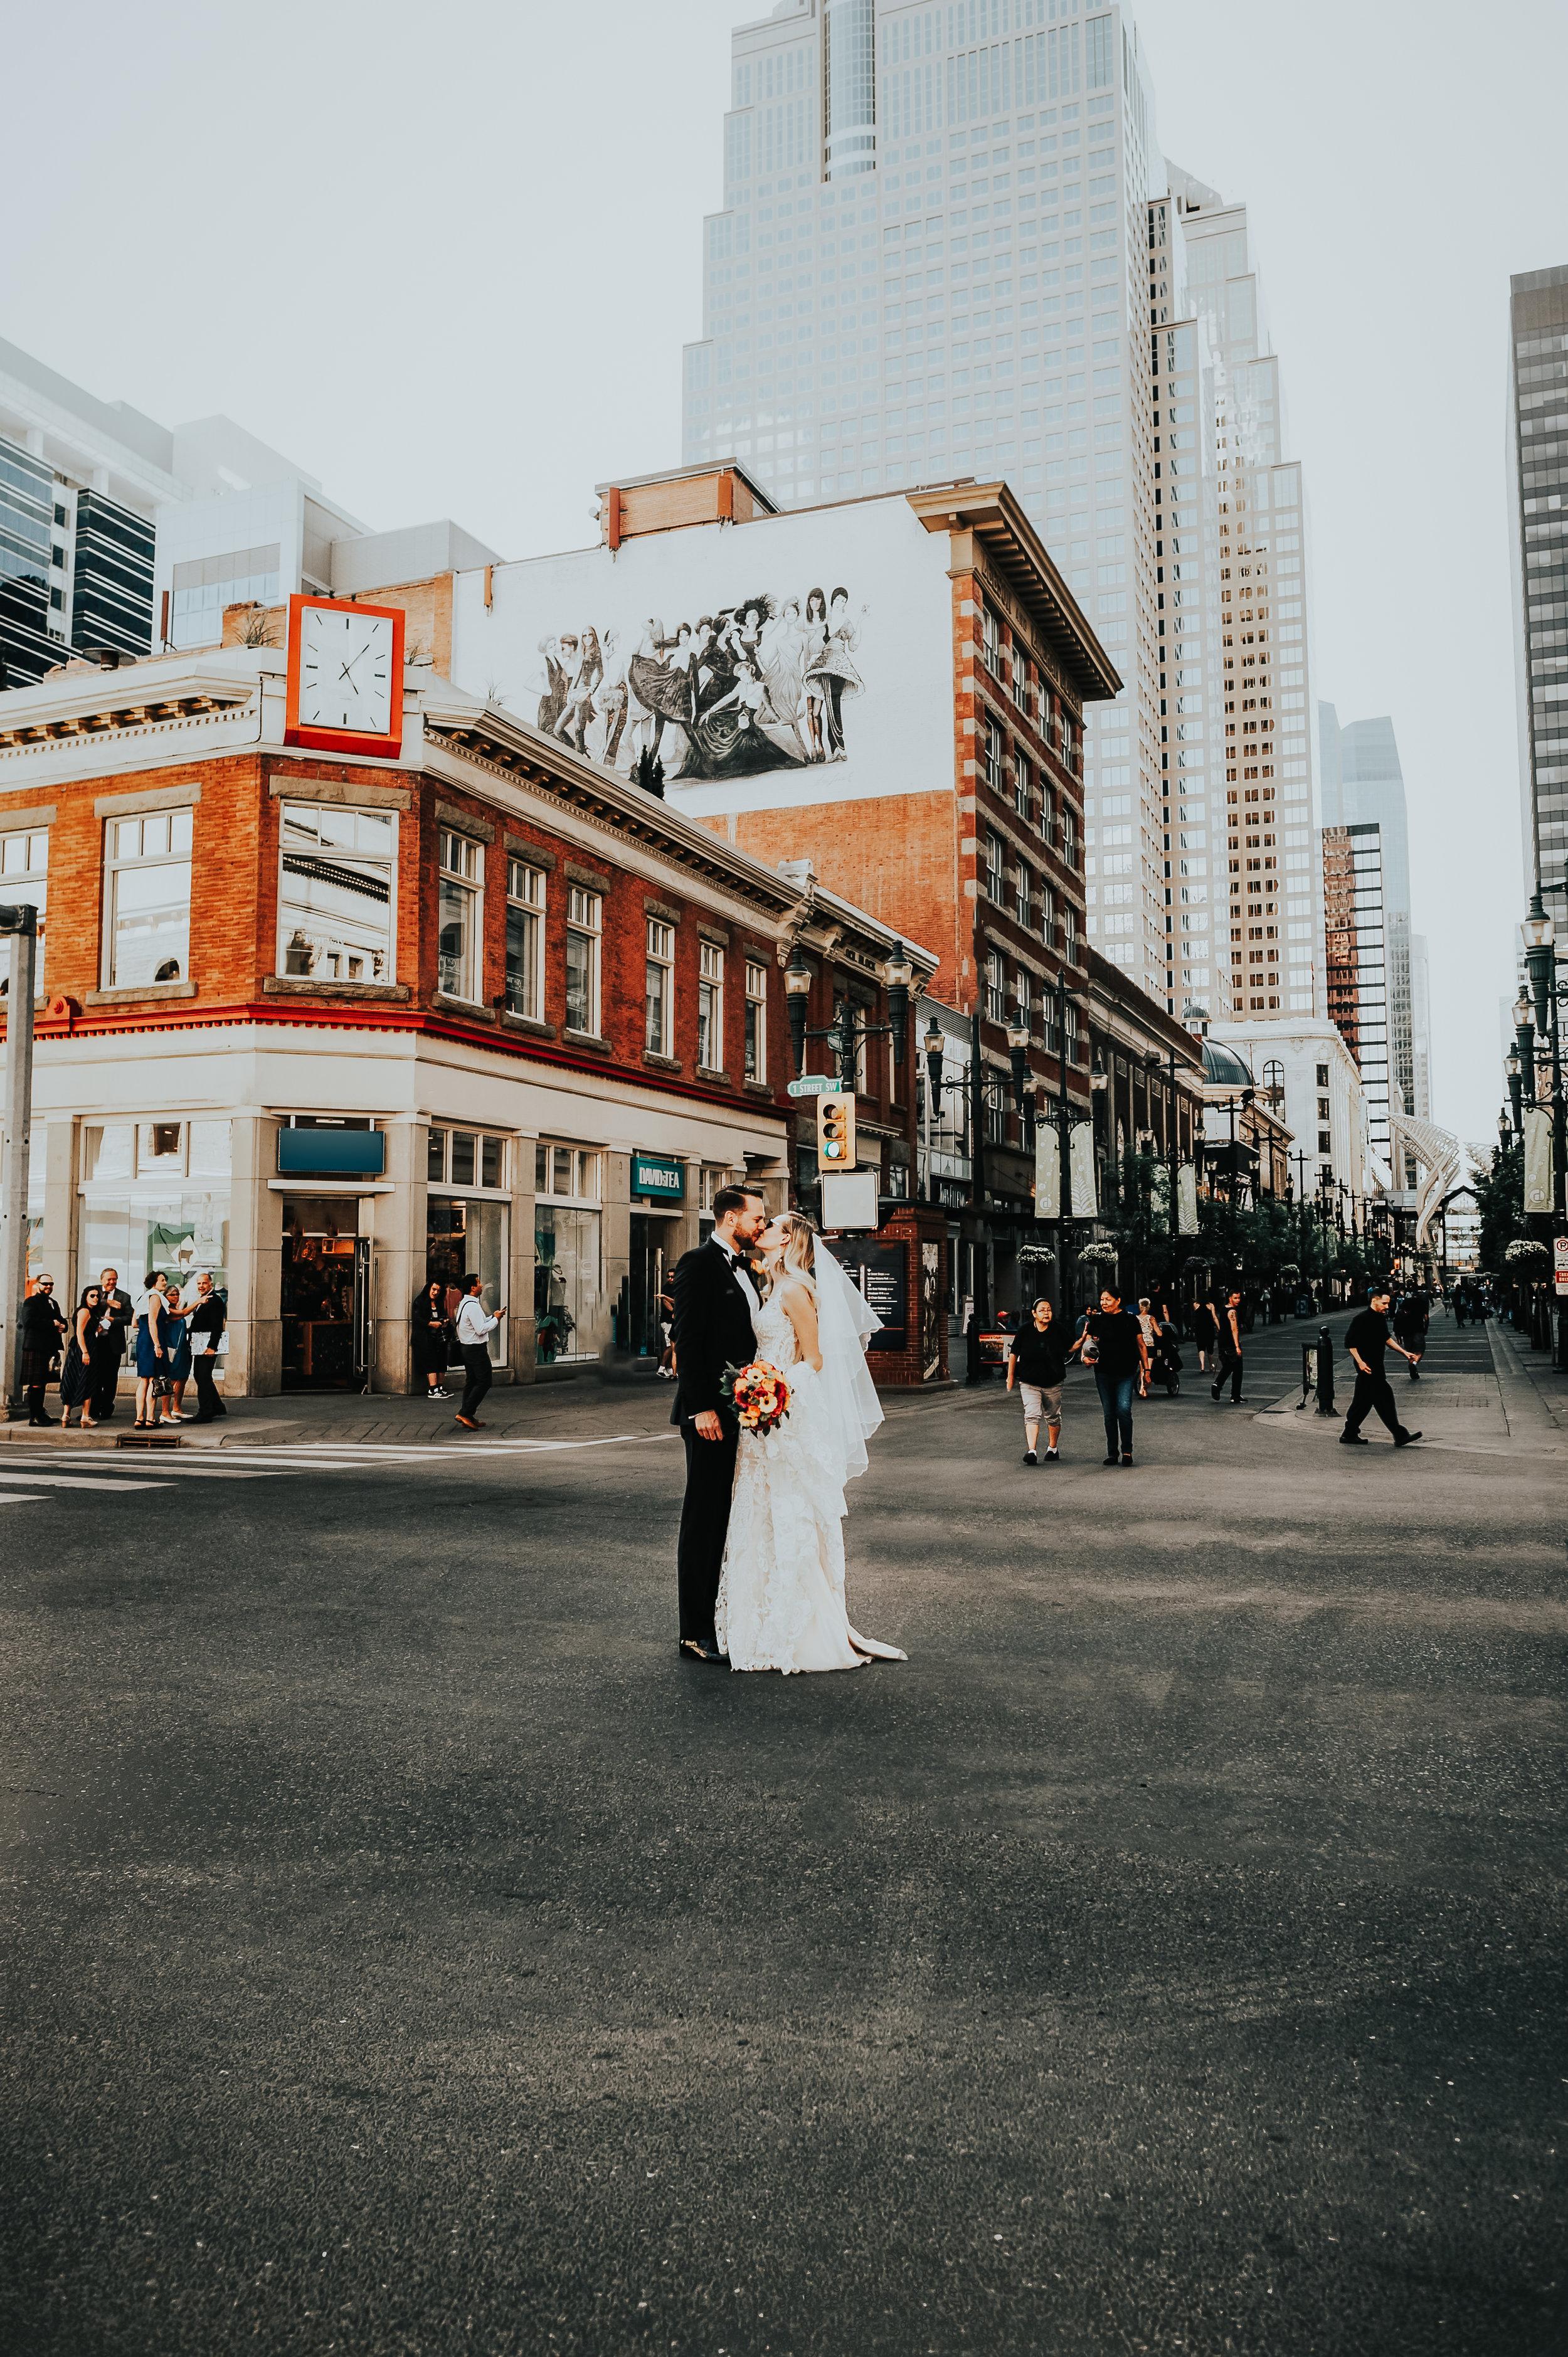 kelowna-wedding-photographer-38.jpg